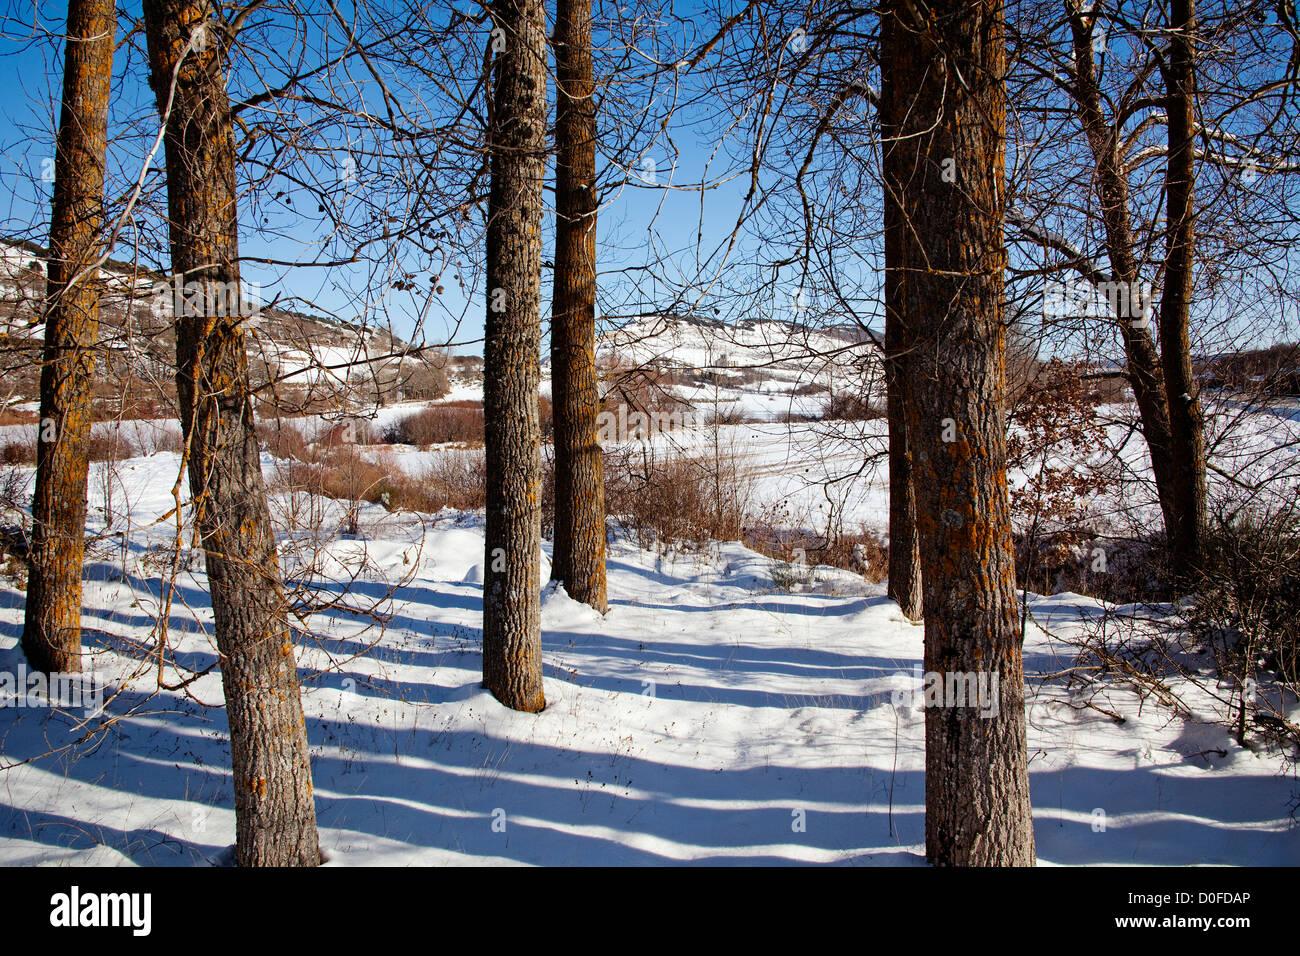 Snowy landscape Burgos province Castile Leon Spain Paisaje nevado provincia de Burgos Castilla León España - Stock Image